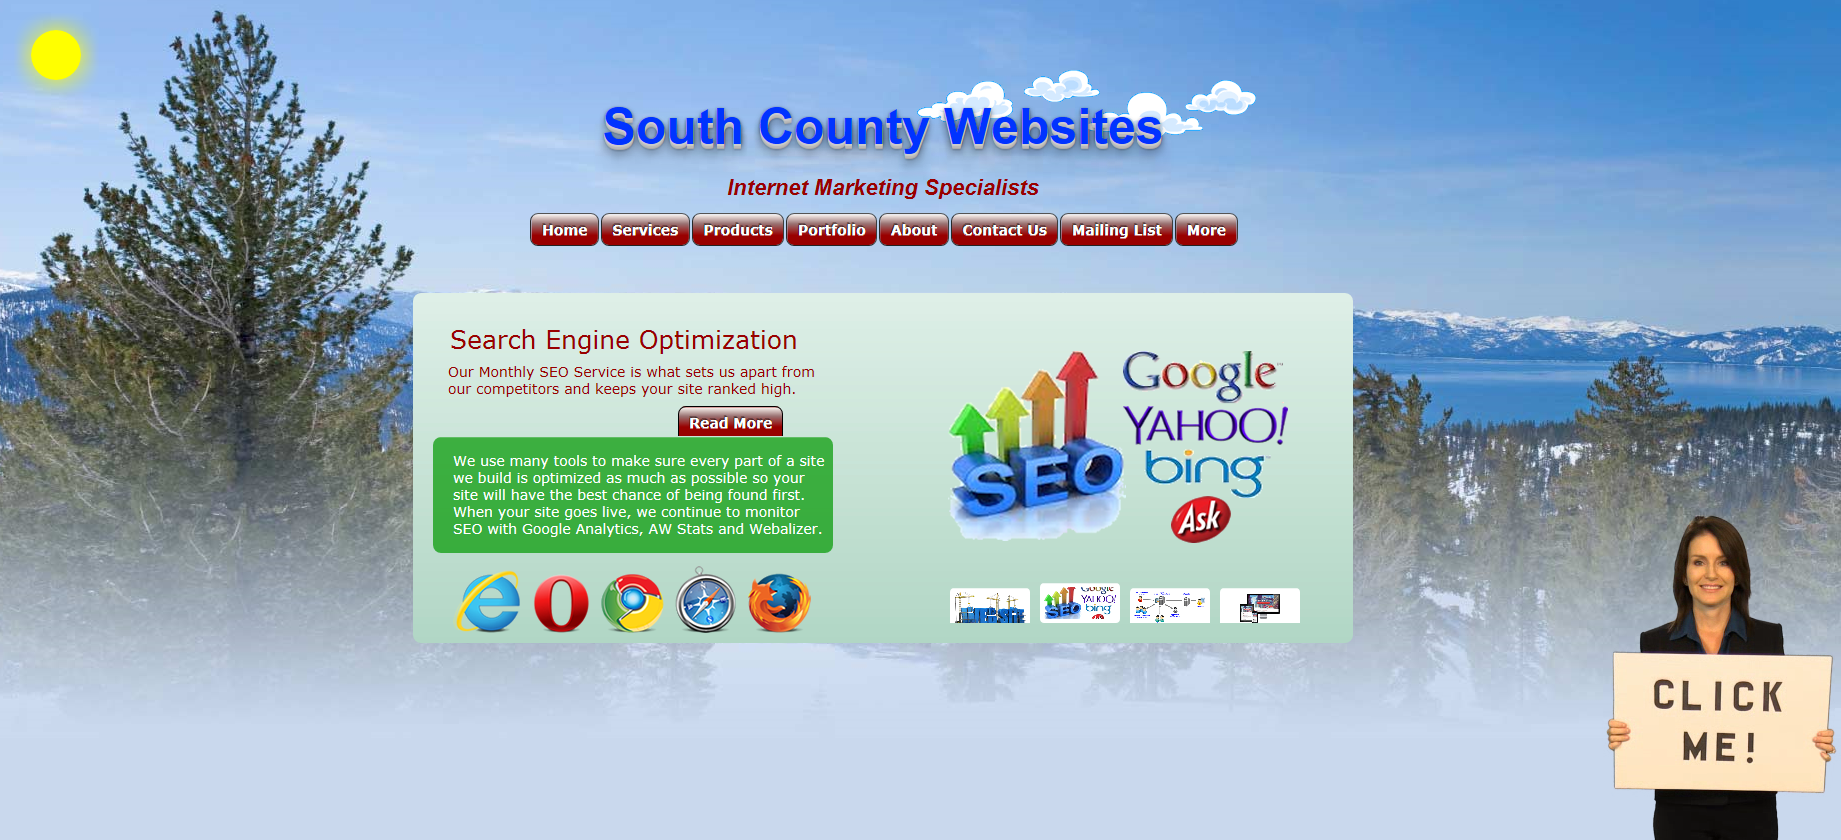 South County Websites Home Slider